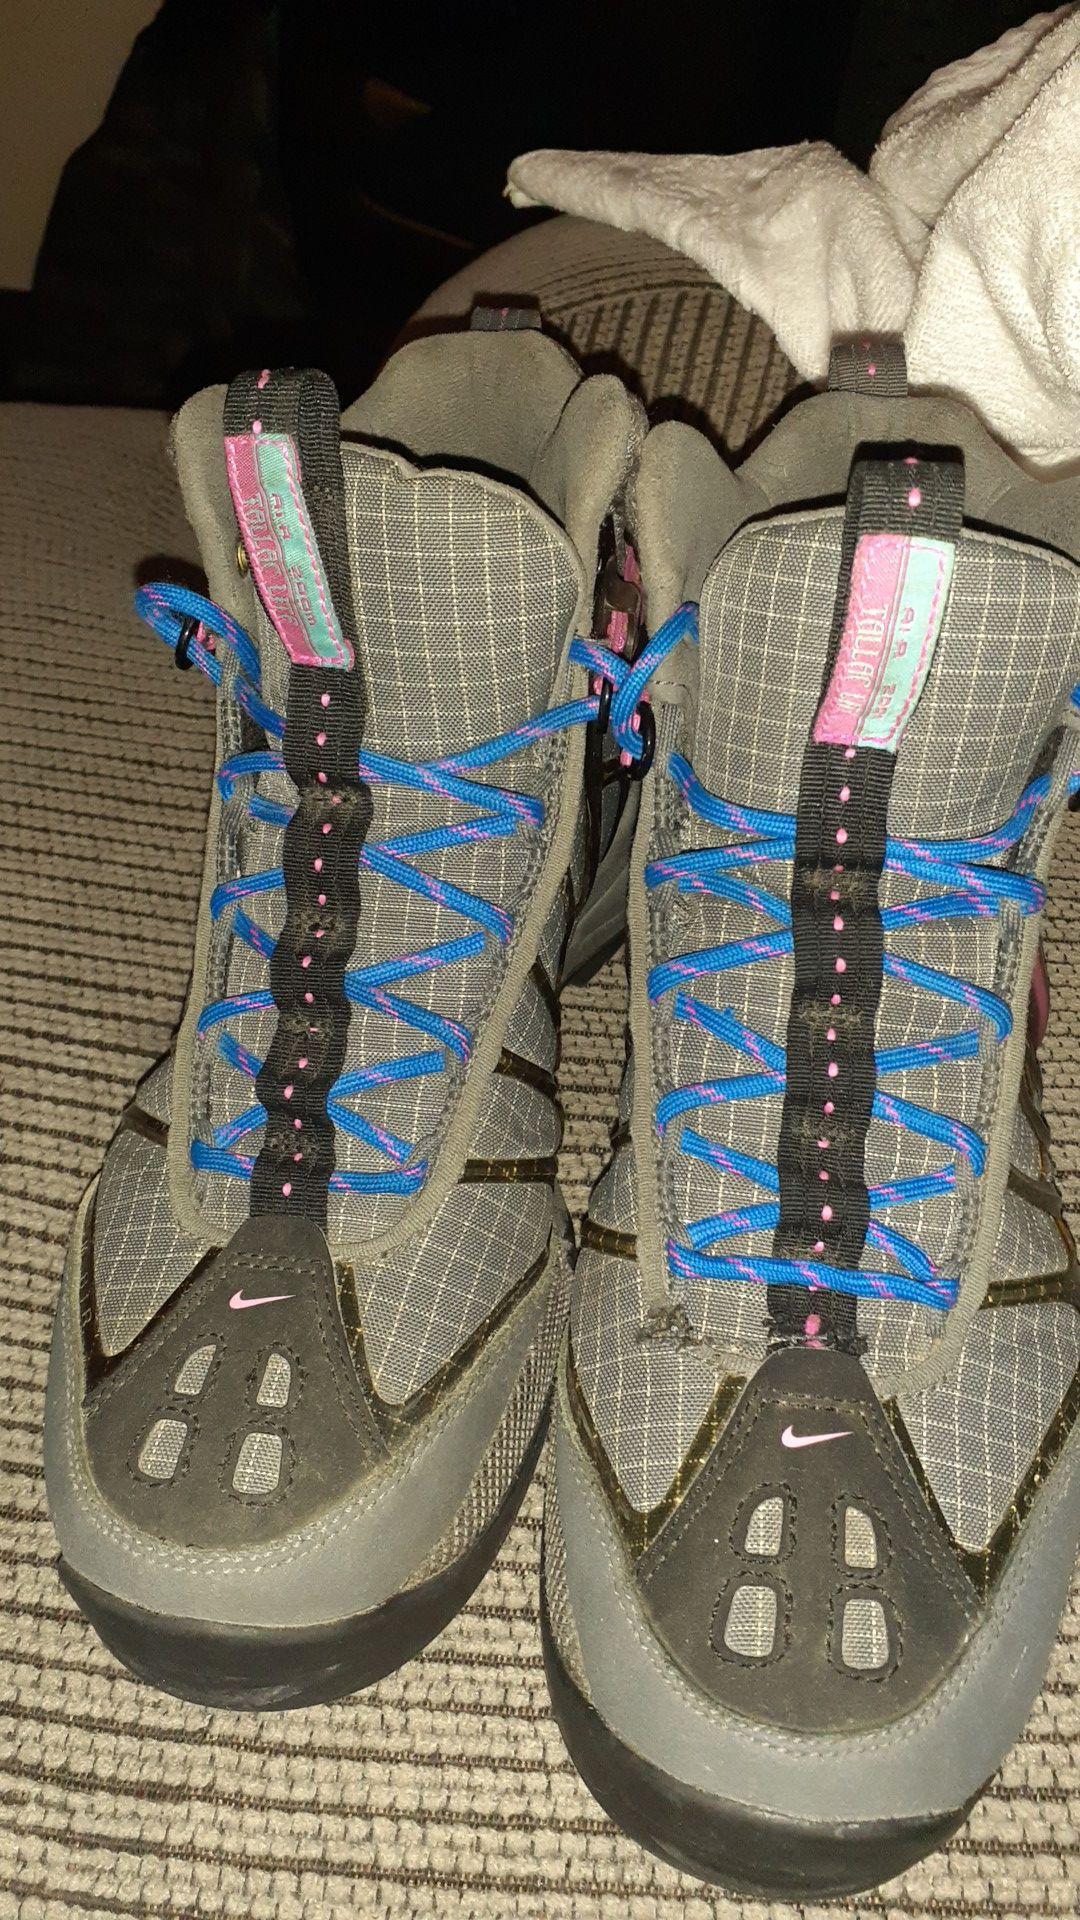 Nike ACG tallac lite sneaker boot